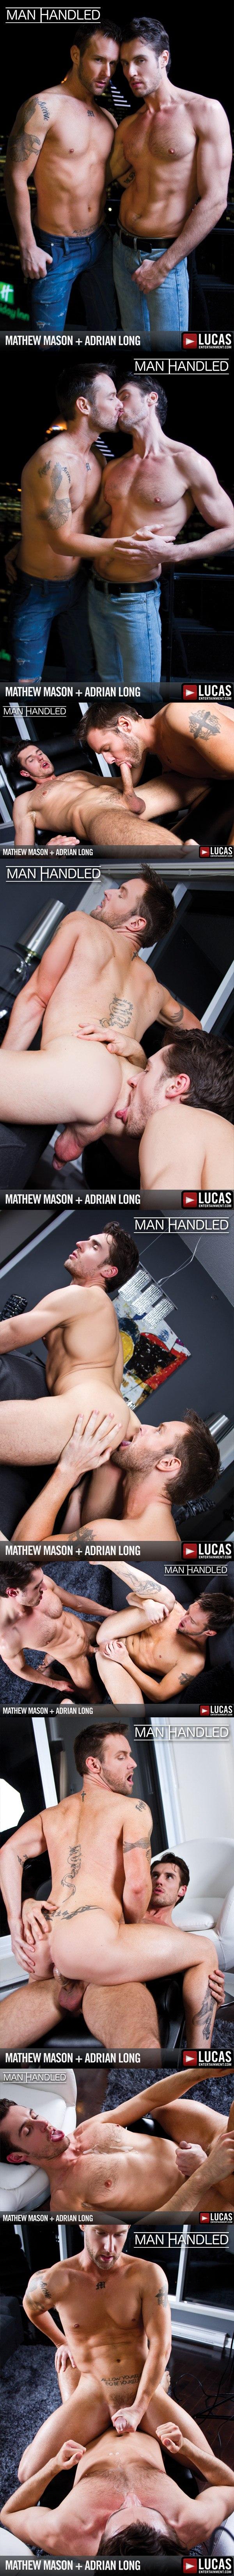 Big-dicked Sexy Adrian Long Pounds Hot Australian Mathew Mason at Lucasentertainment 01